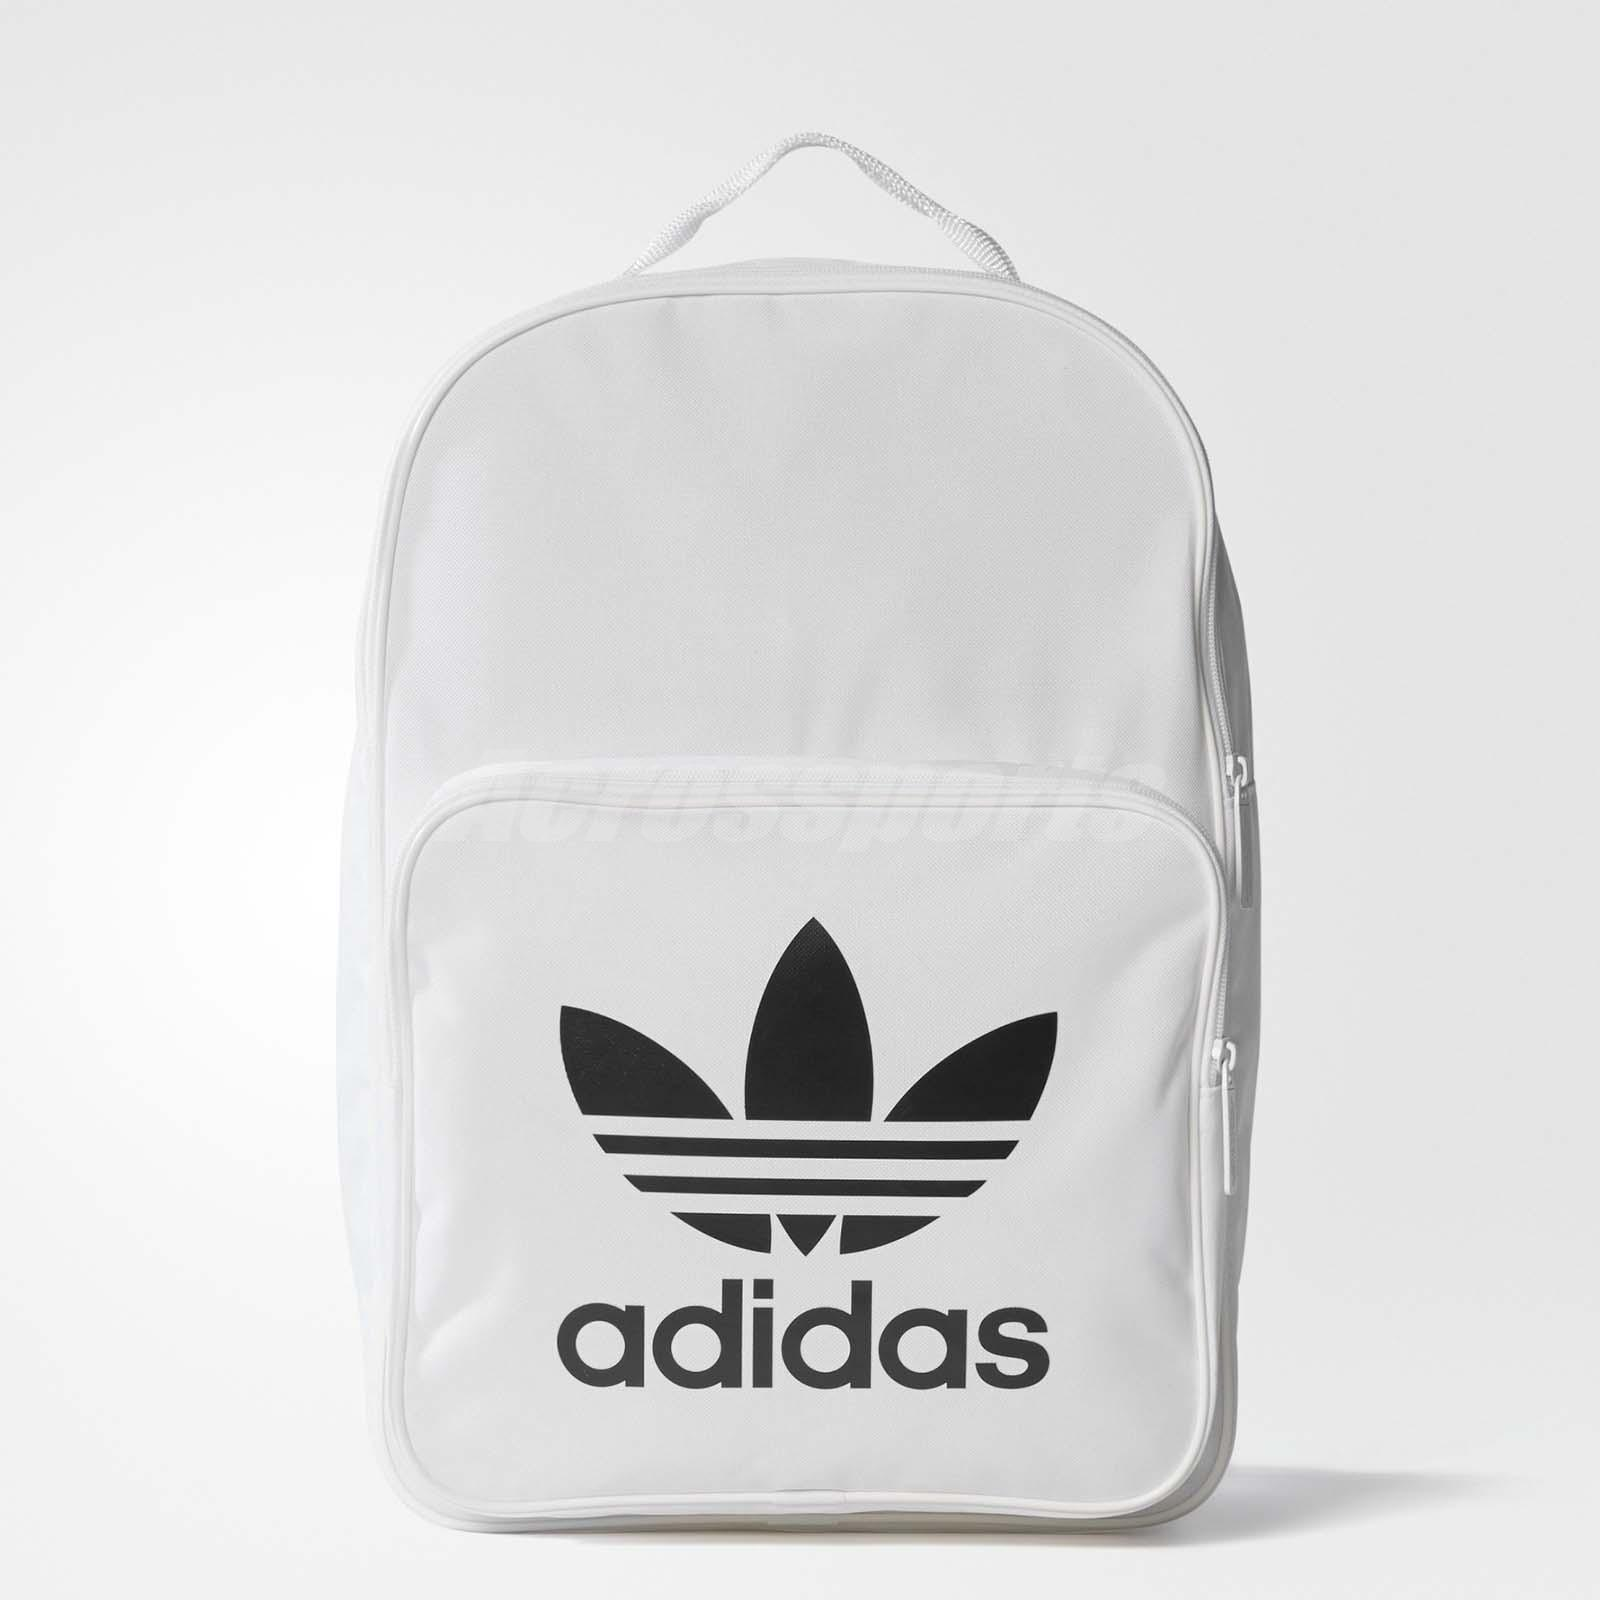 adidas backpack white